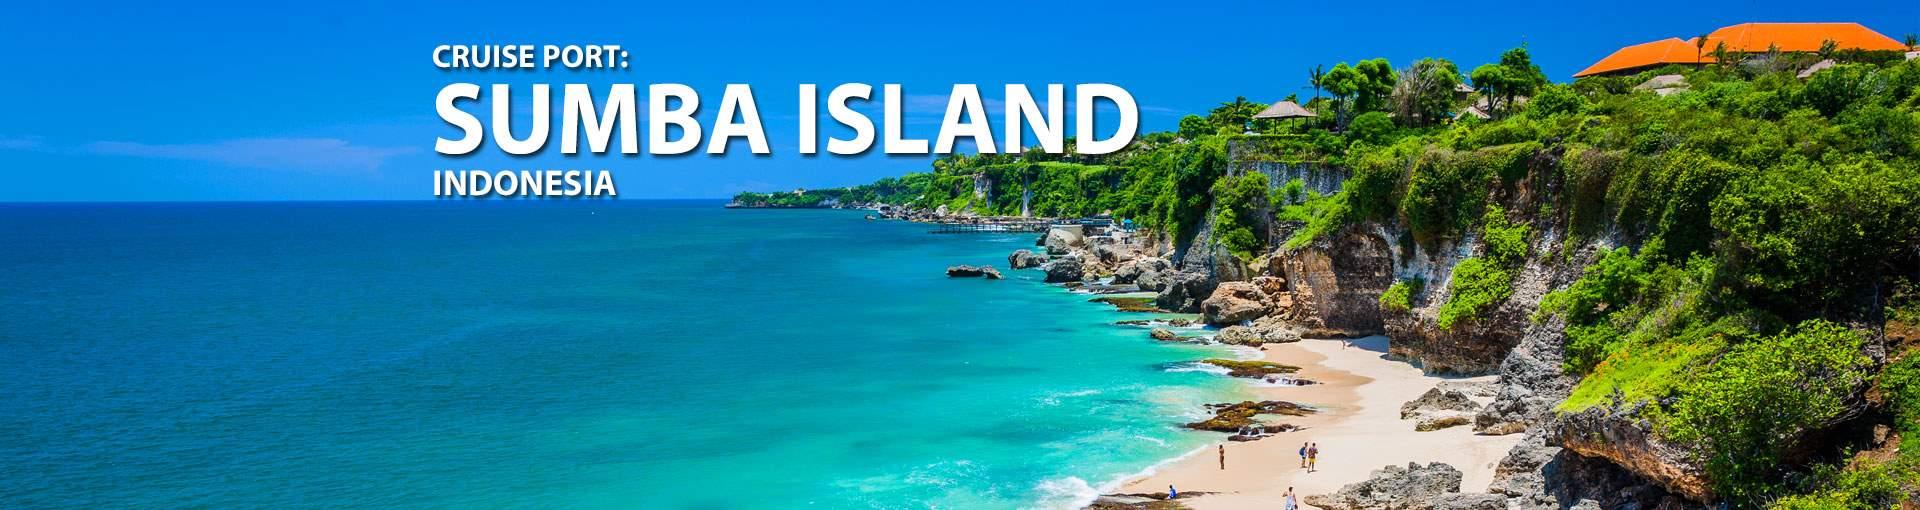 Sumba Island, Indonesia Cruise Port